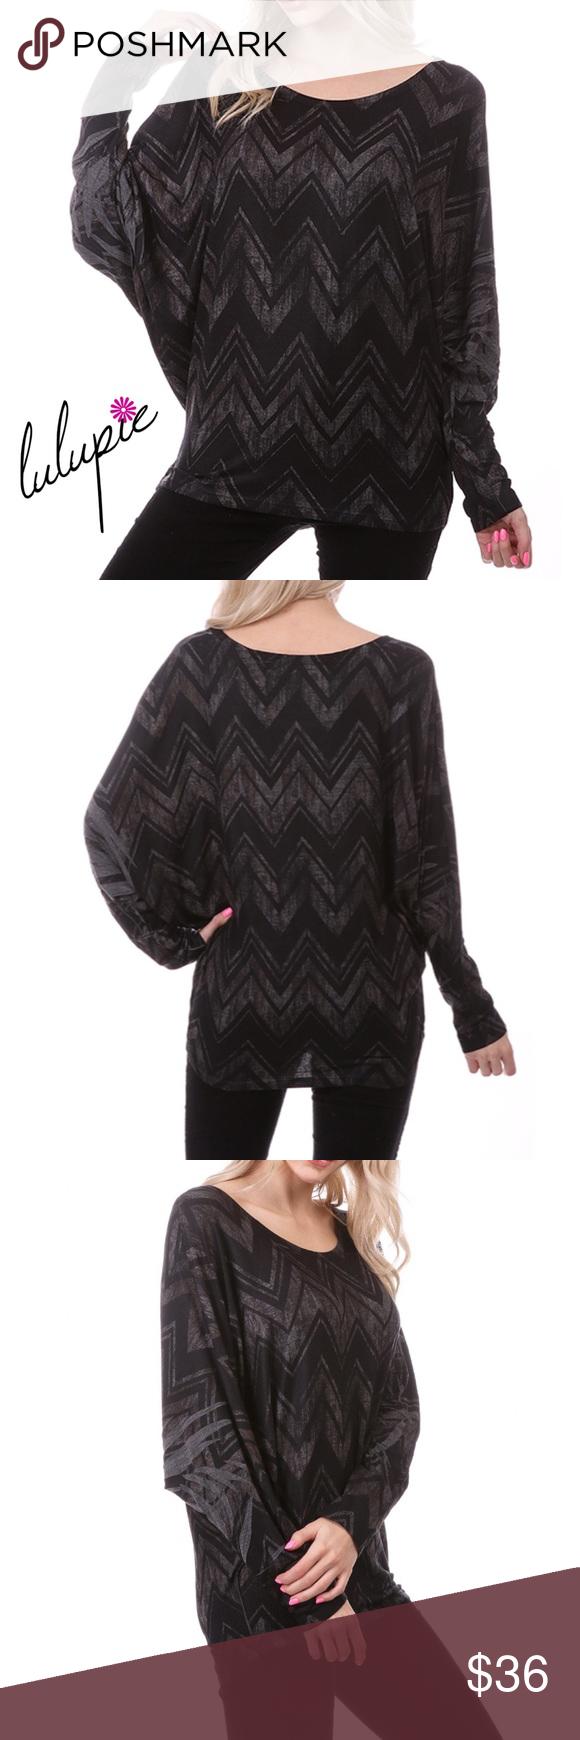 Black Gray Dolman Long Sleeve Top Black Gray Dolman Long Sleeve Top. Fits true to size. Made of poly/ rayon/ spandex blend. Made in USA 🇺🇸 Bchic Tops